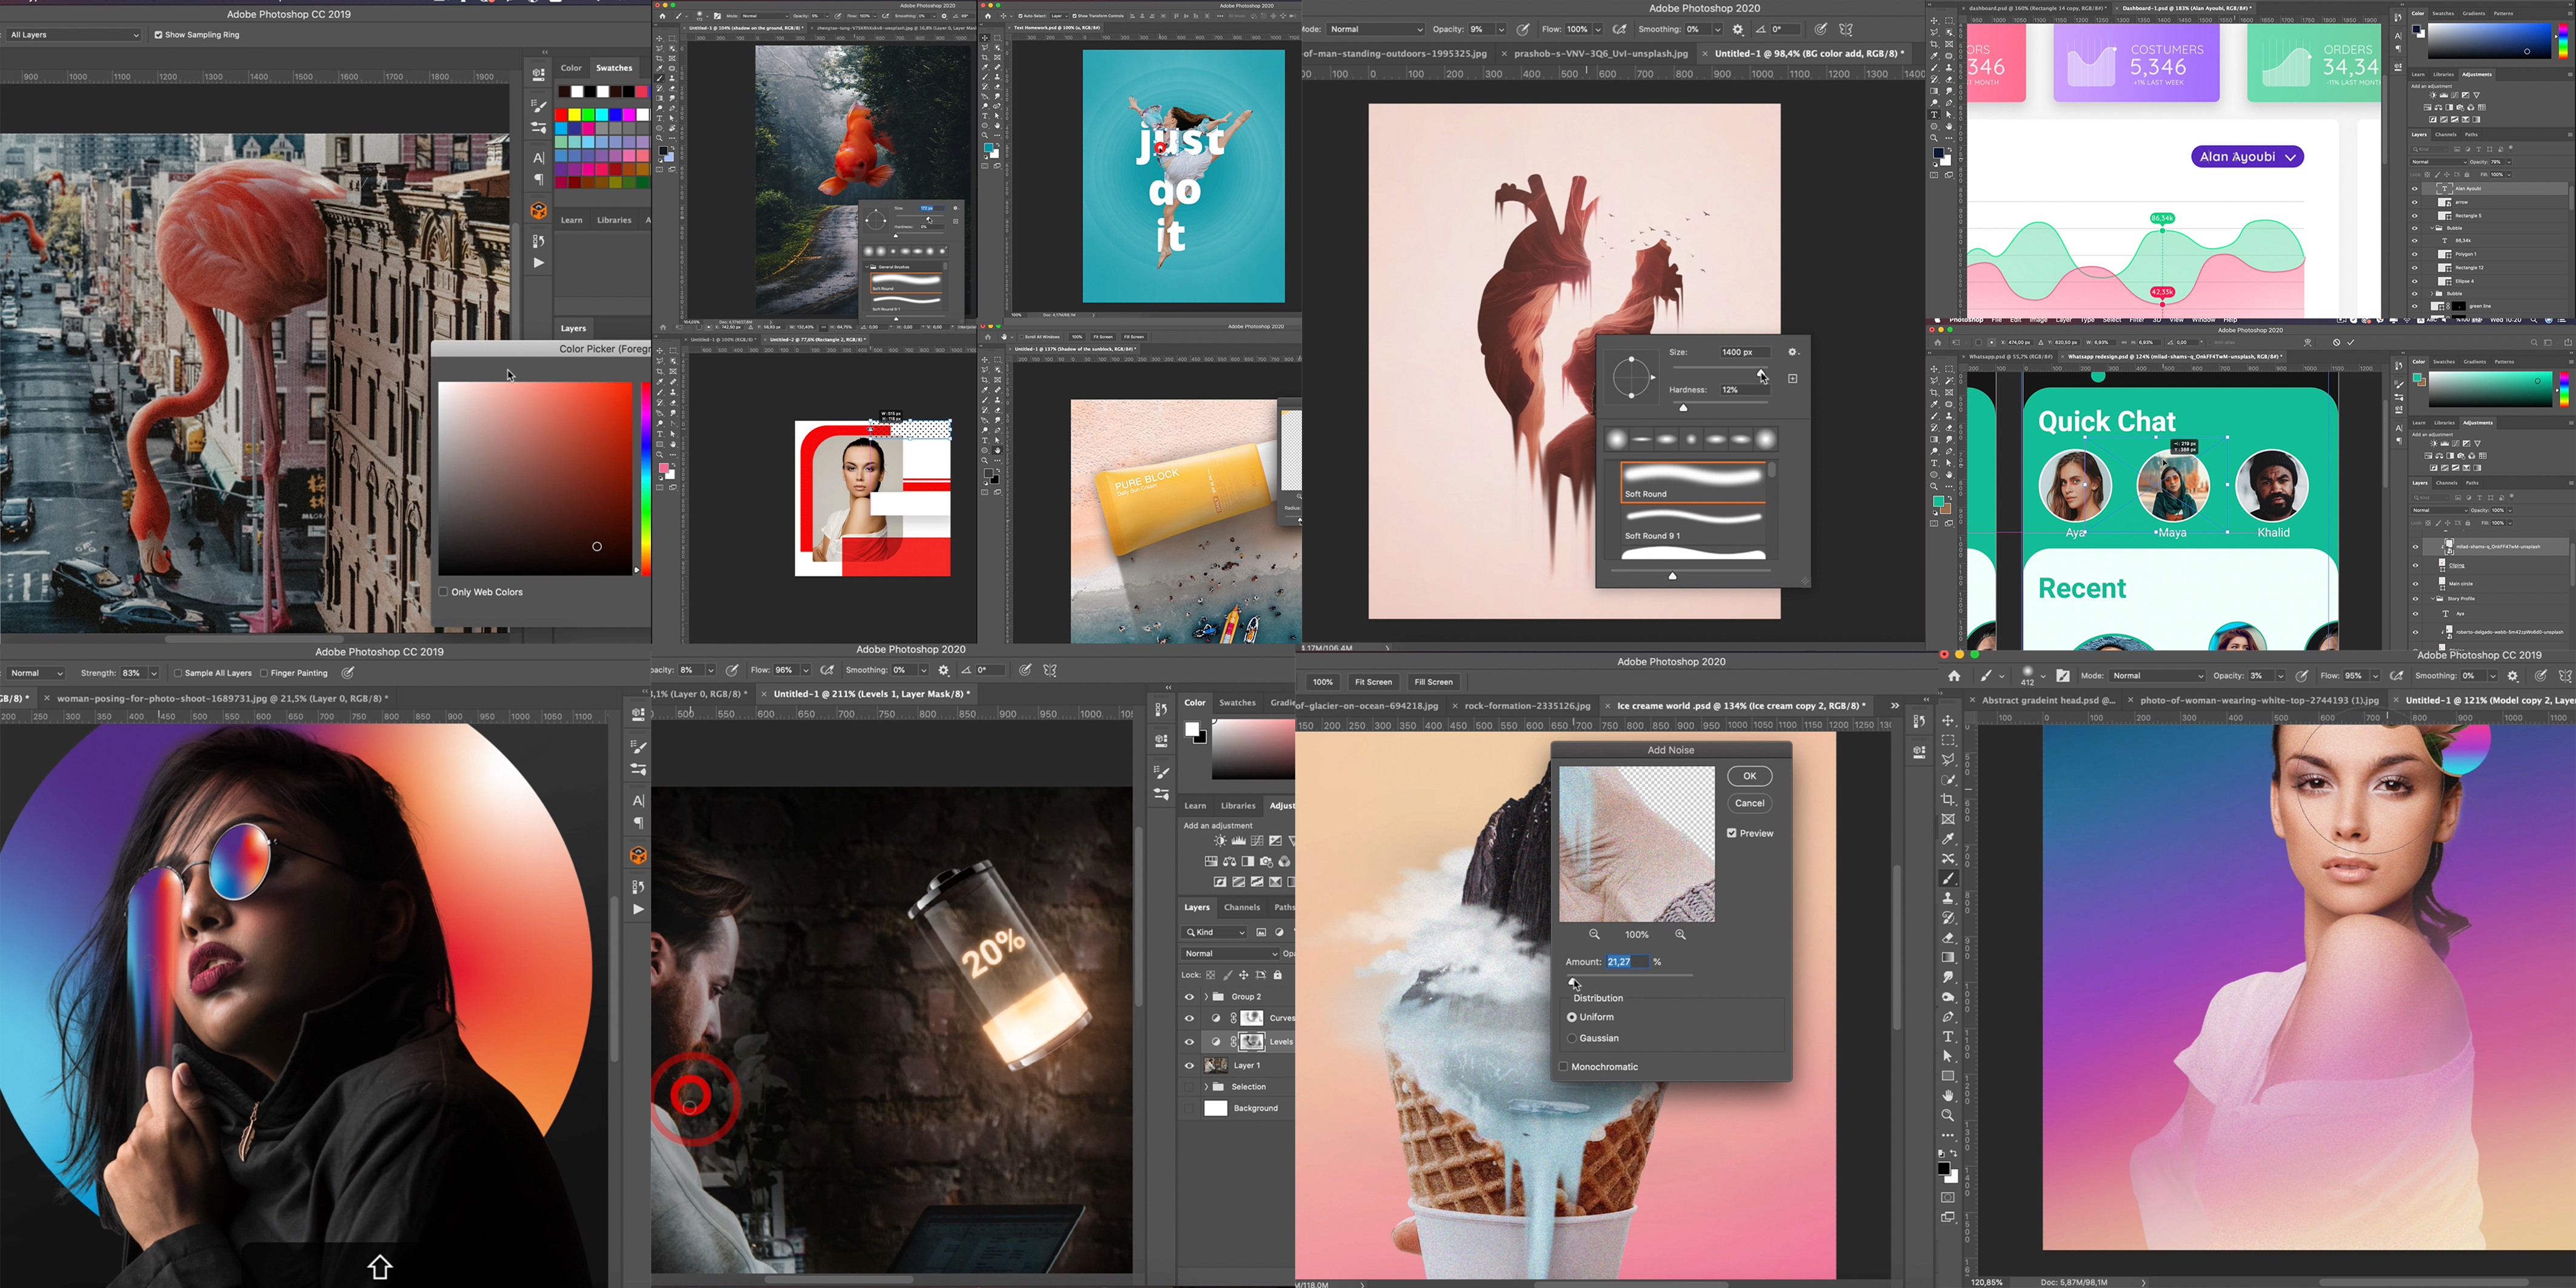 Adobe Photoshop Mega Course